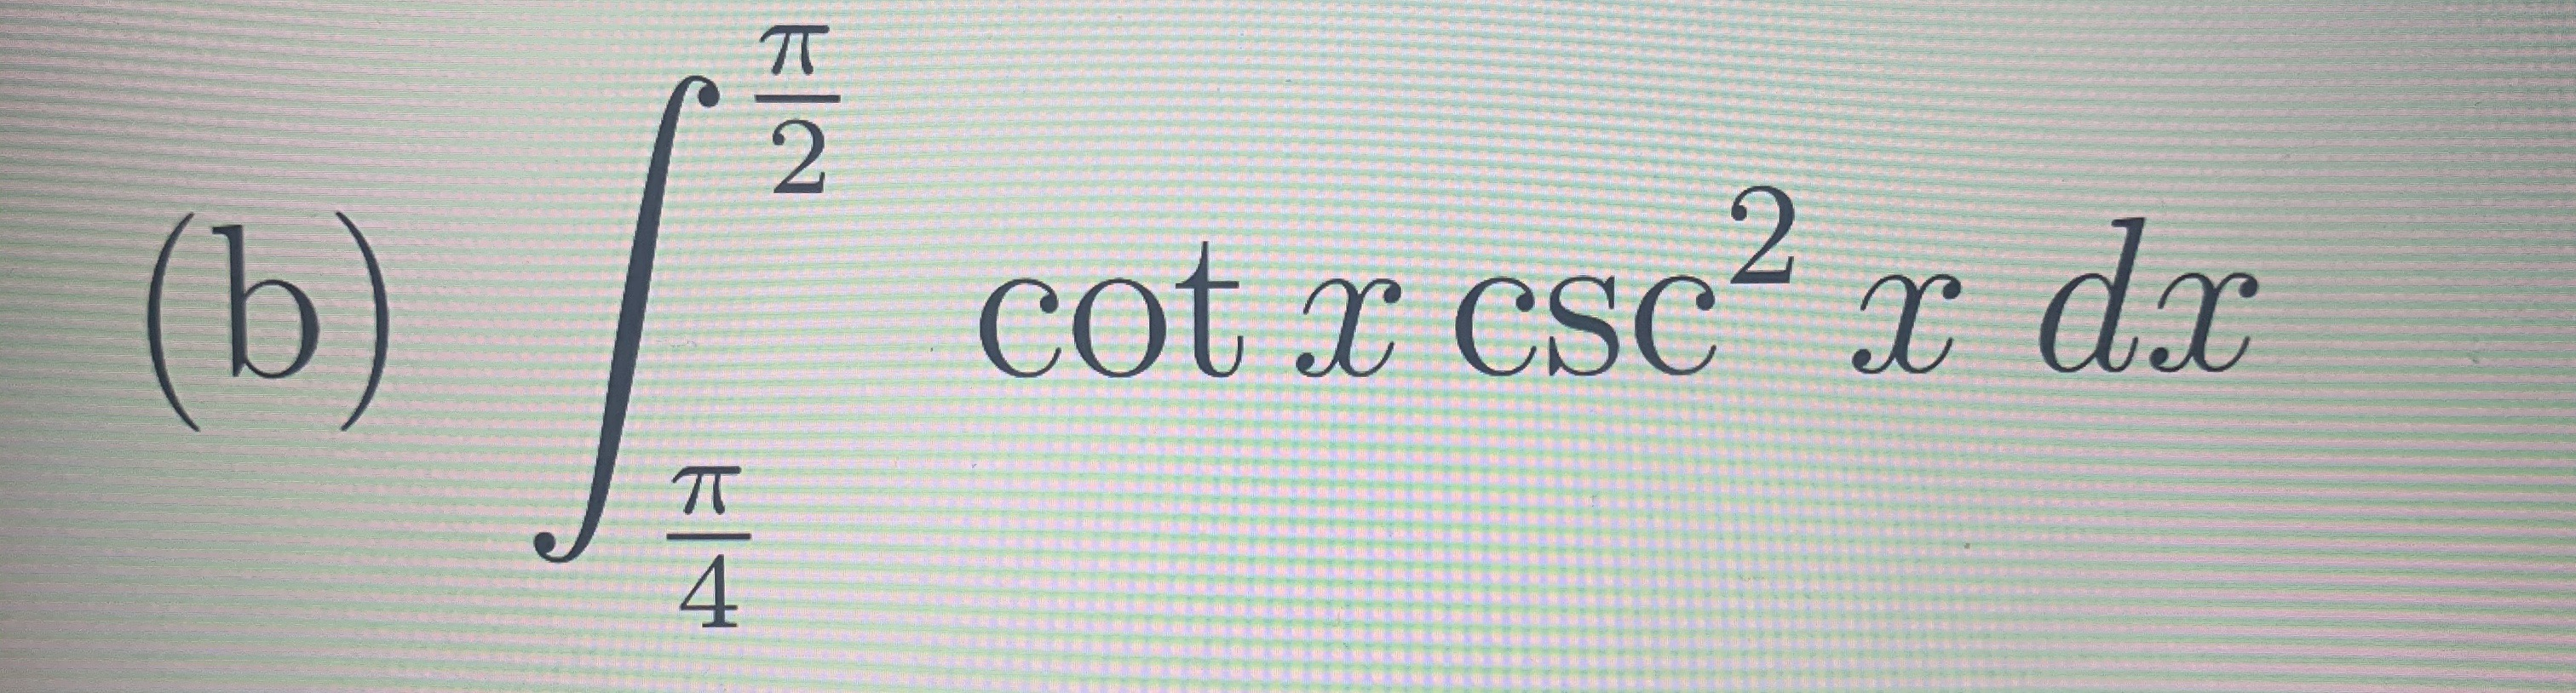 2 2 (b) cot T csc x dx